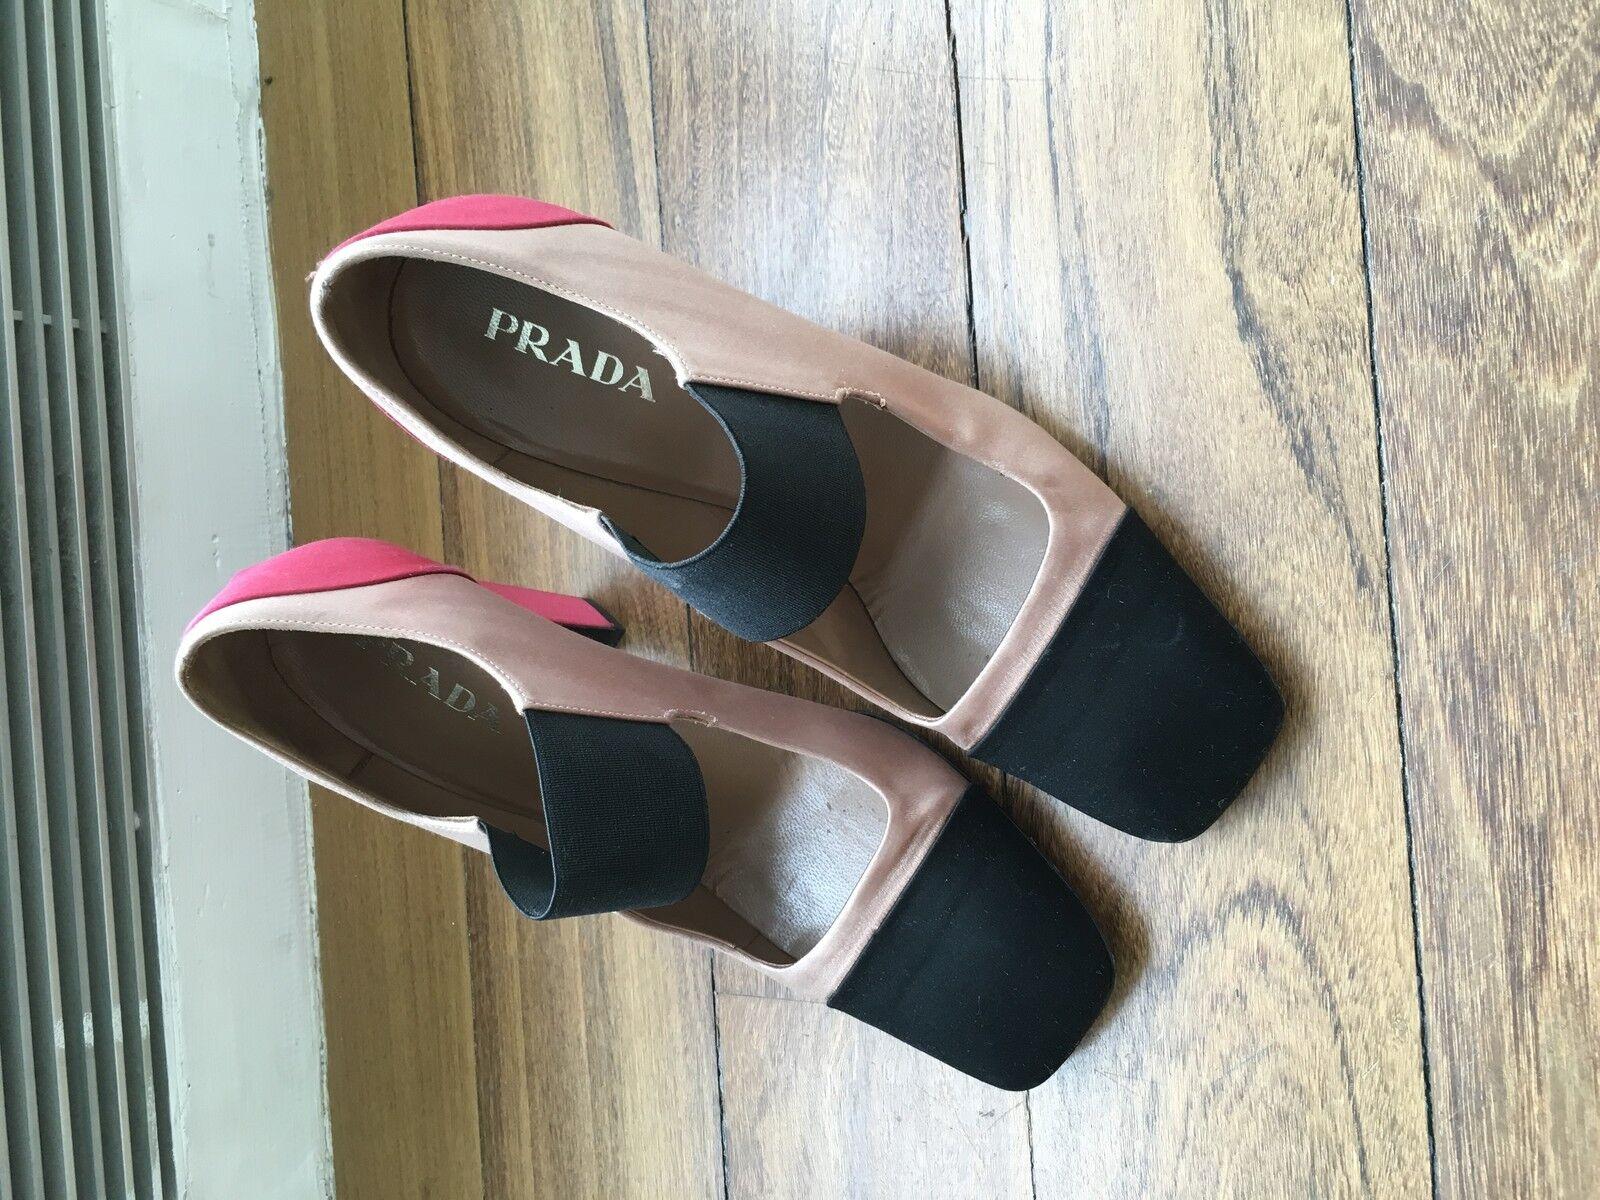 Prada Bombas Zapatos para para para mujer 37.5 EU 7 nosotros  alta calidad